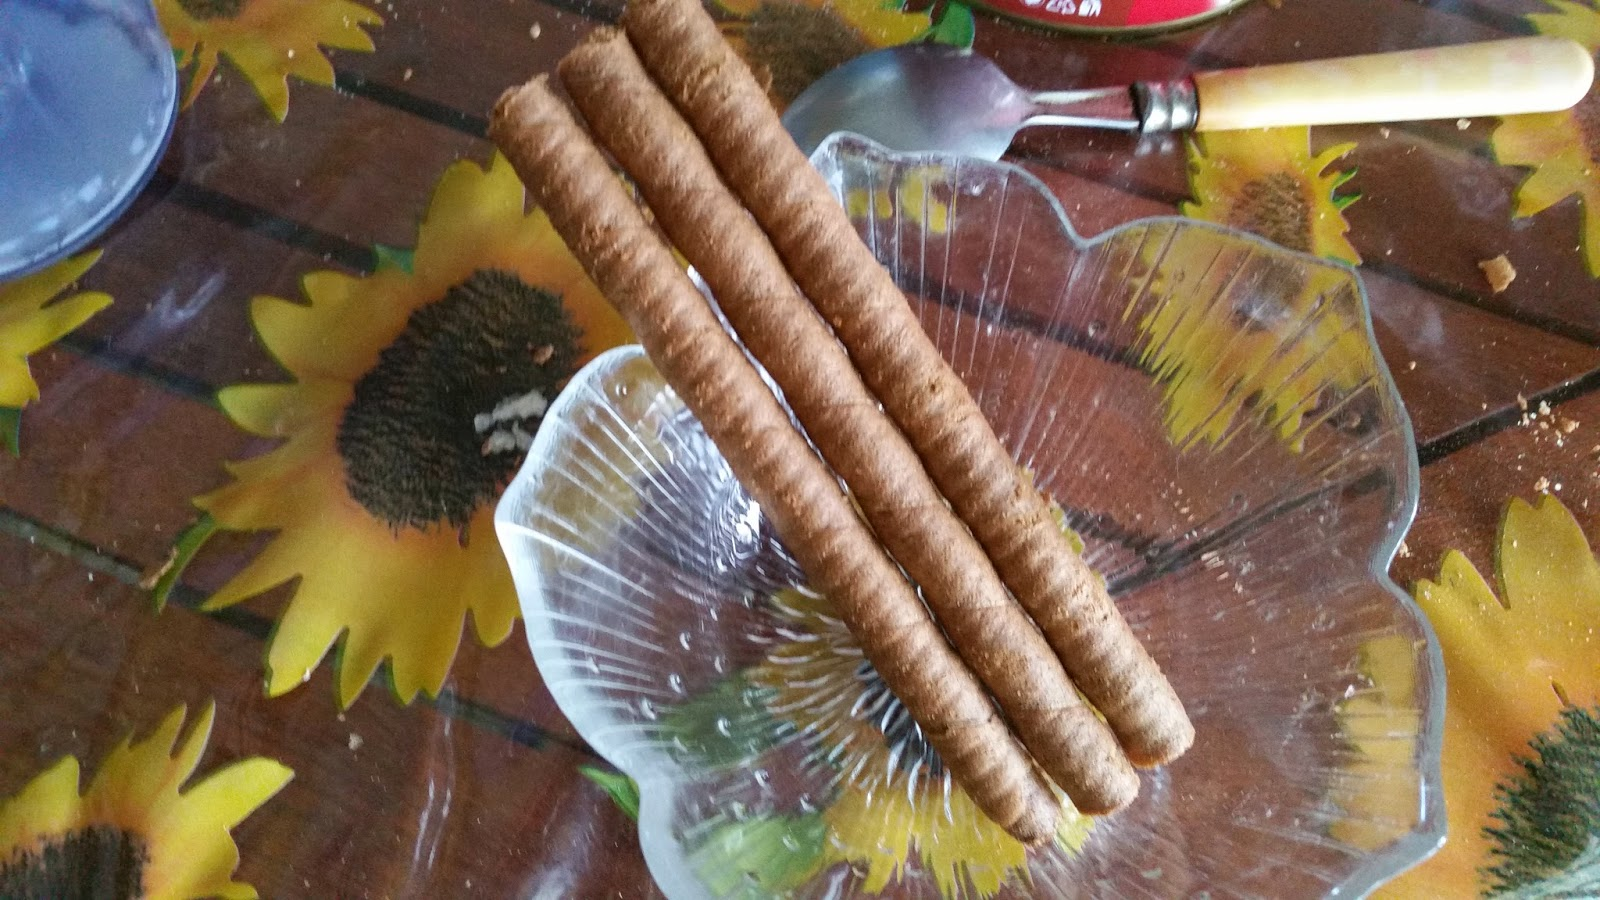 http://www.passaparolablog.com/2014/09/recensione-papadopoulos-caprice.html